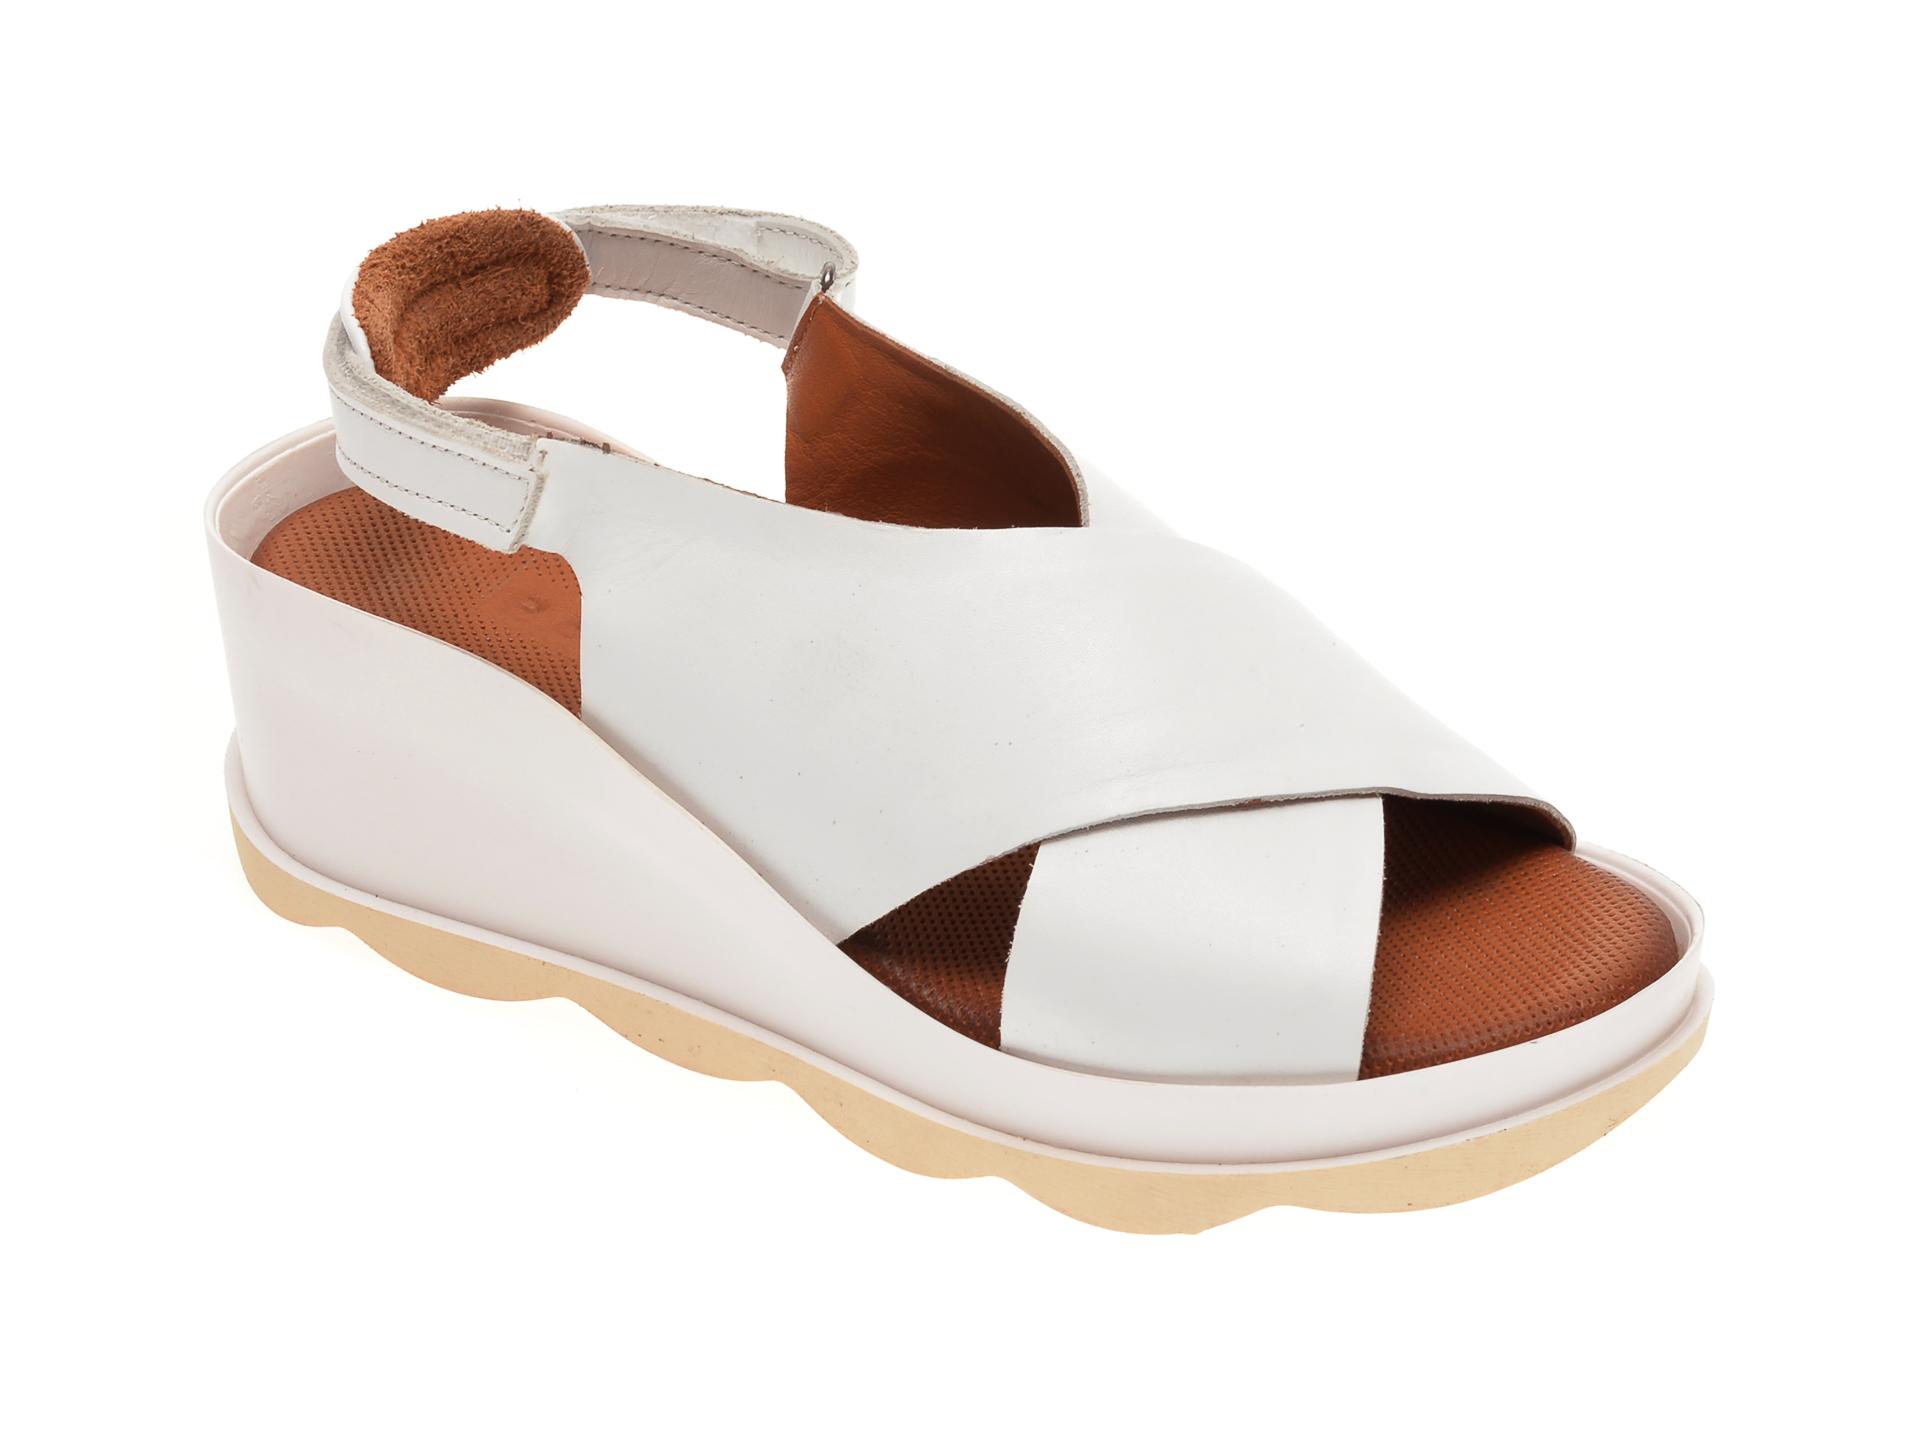 Sandale BABOOS albe, 0506, din piele naturala